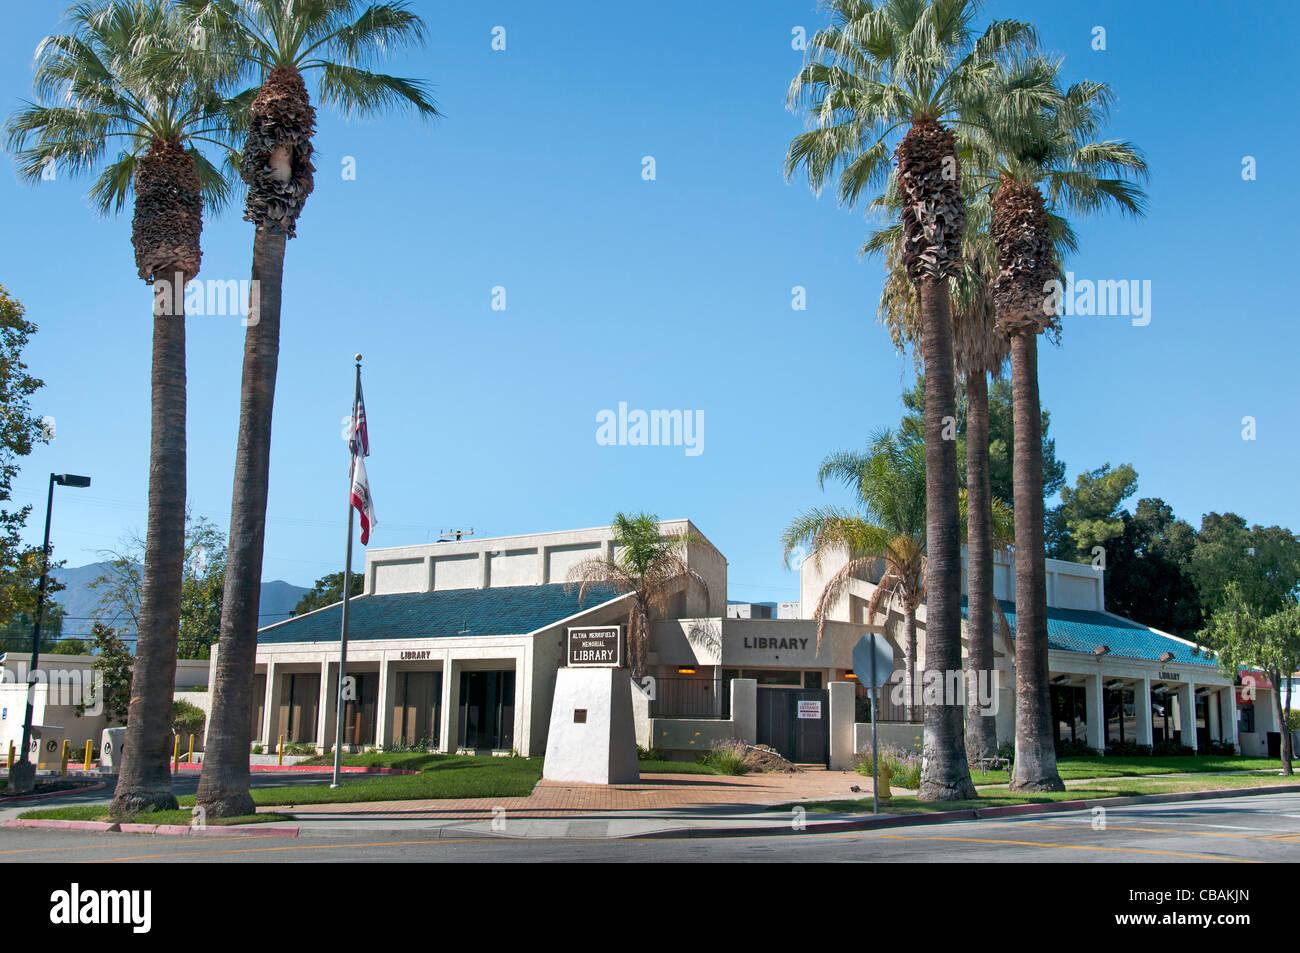 Library Lake Elsinore California United States of America Stock Photo